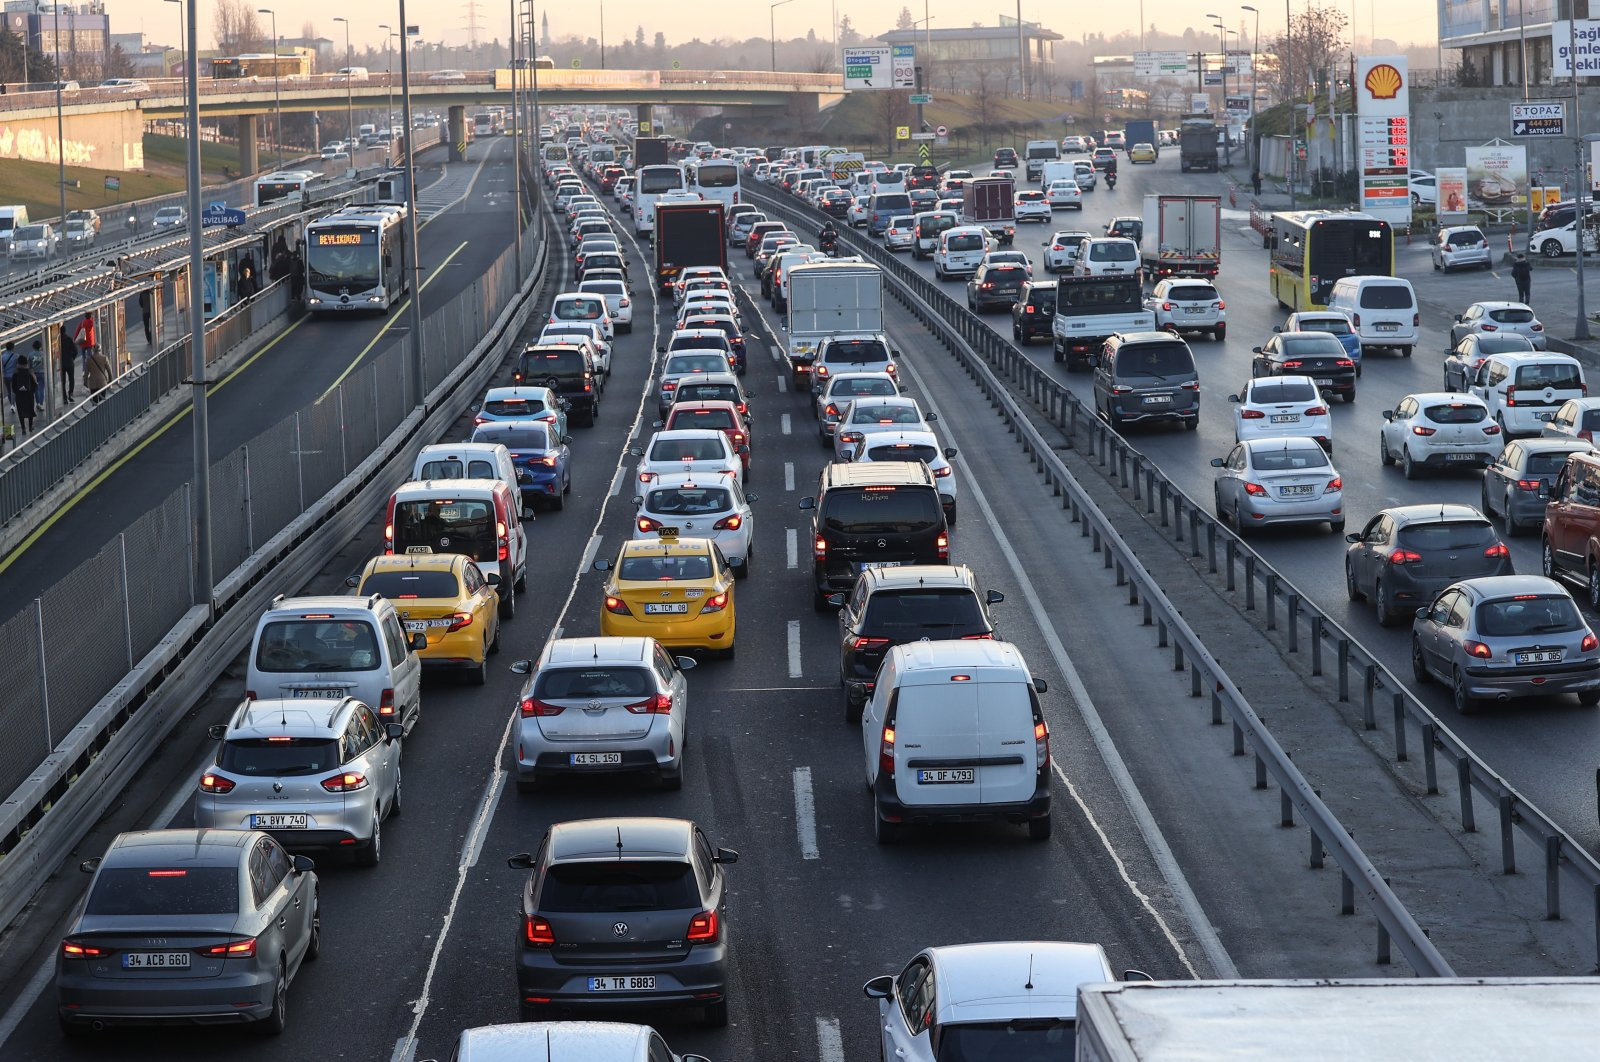 Vehicles are seen on a road amid traffic density on D-100 Highway in Cevizlibağ, Istanbul, Turkey, March 1, 2021. (AA Photo)